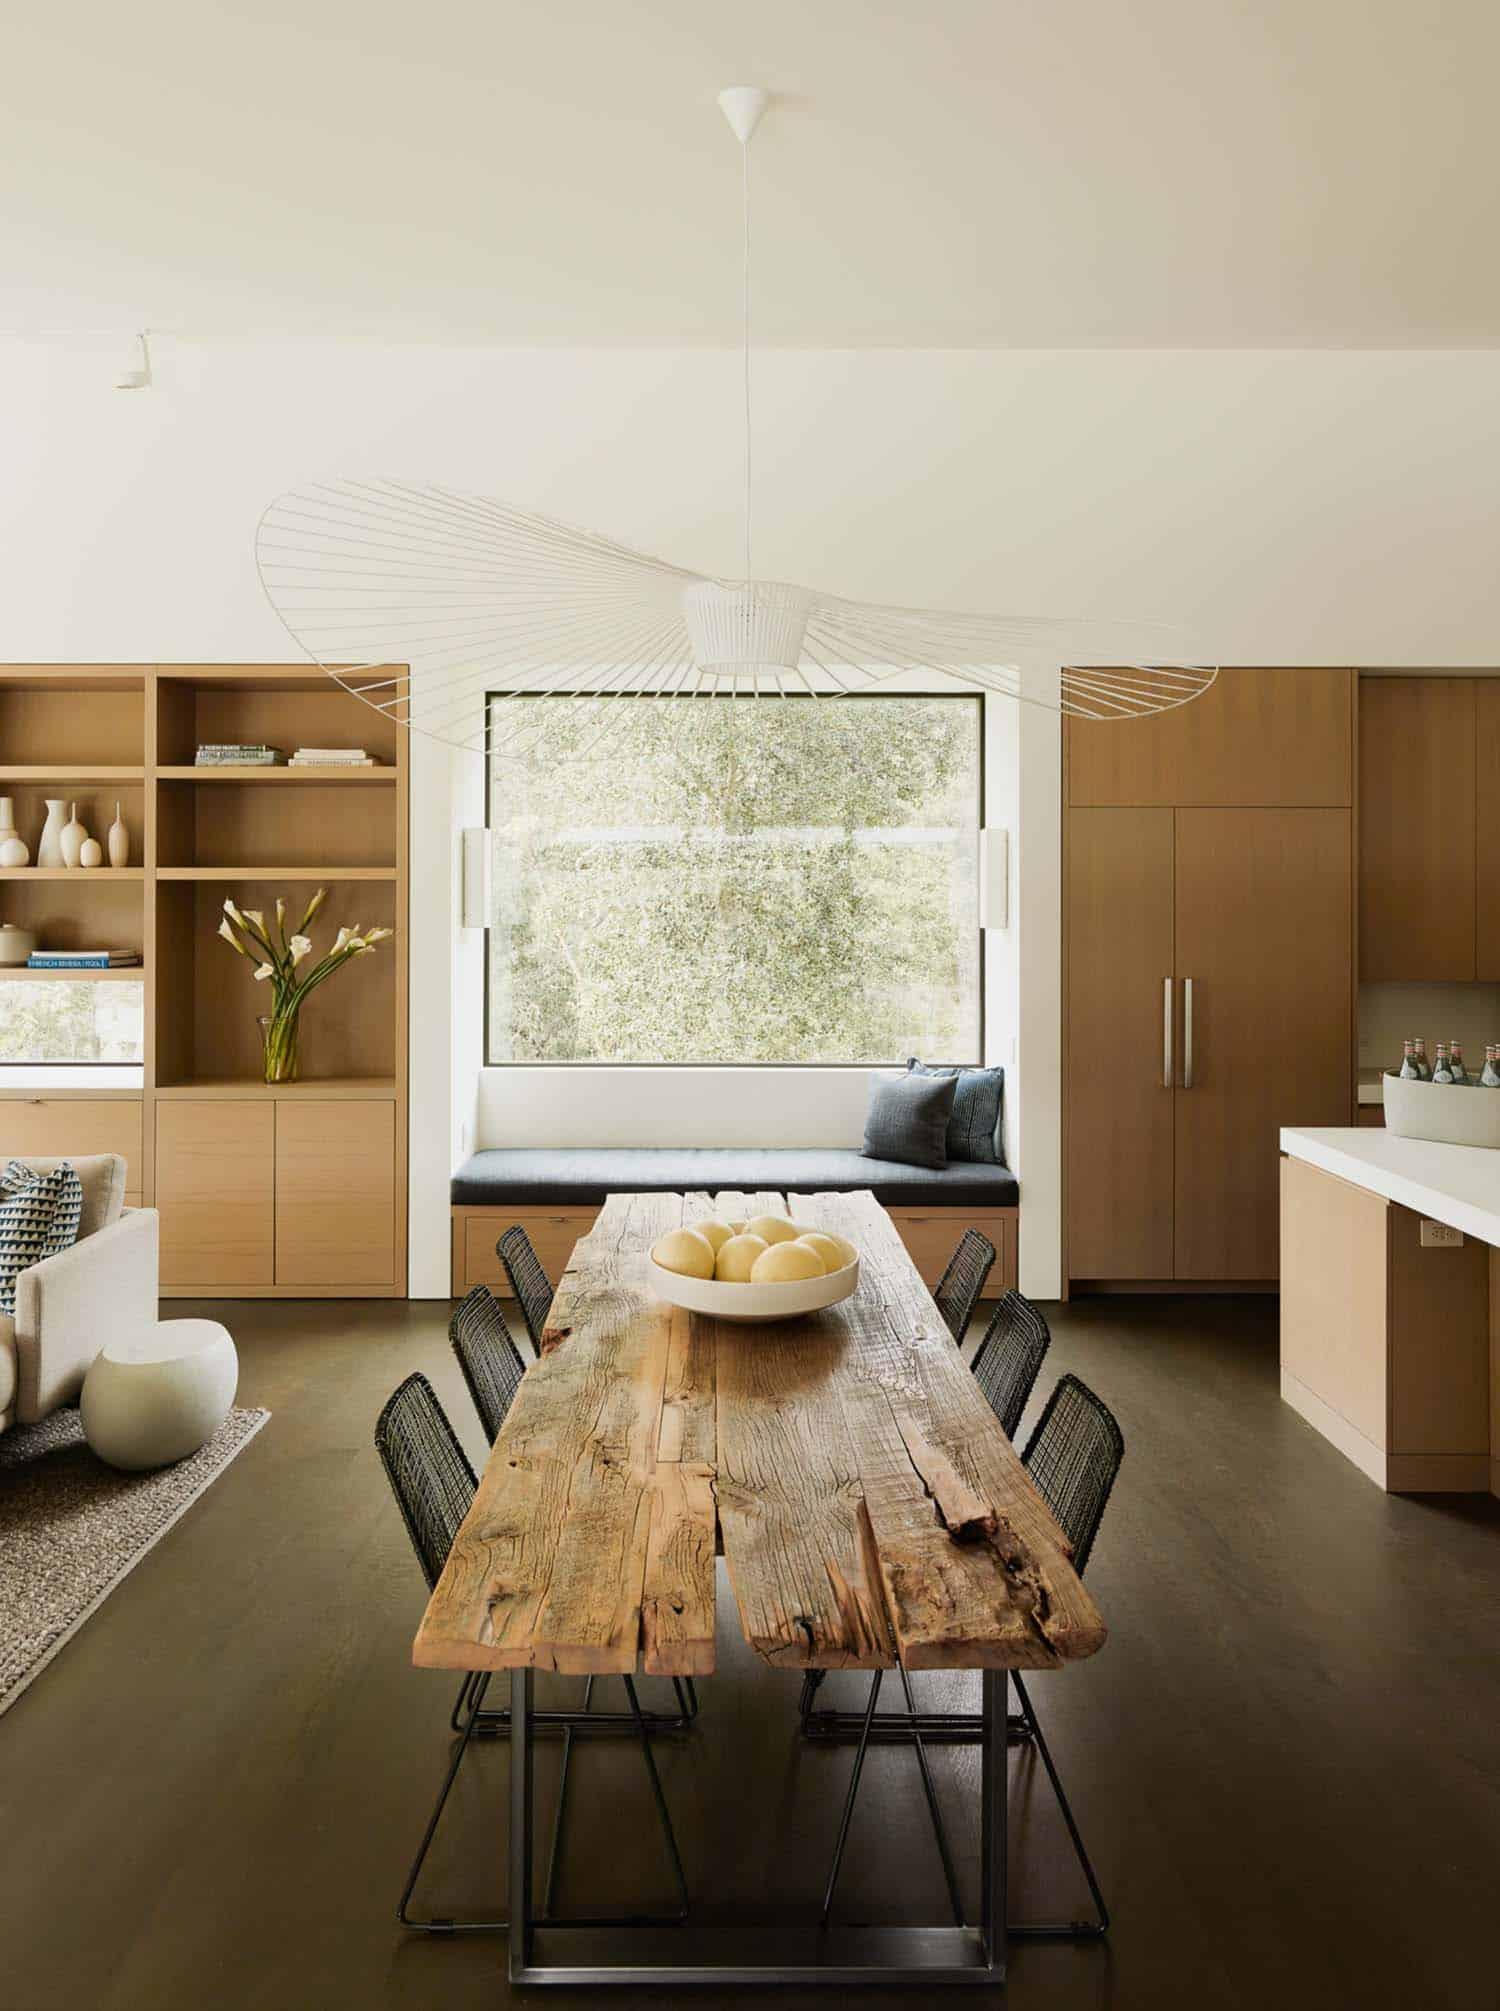 Modern Weekend Retreat-Butler Armsden Architects-05-1 Kindesign